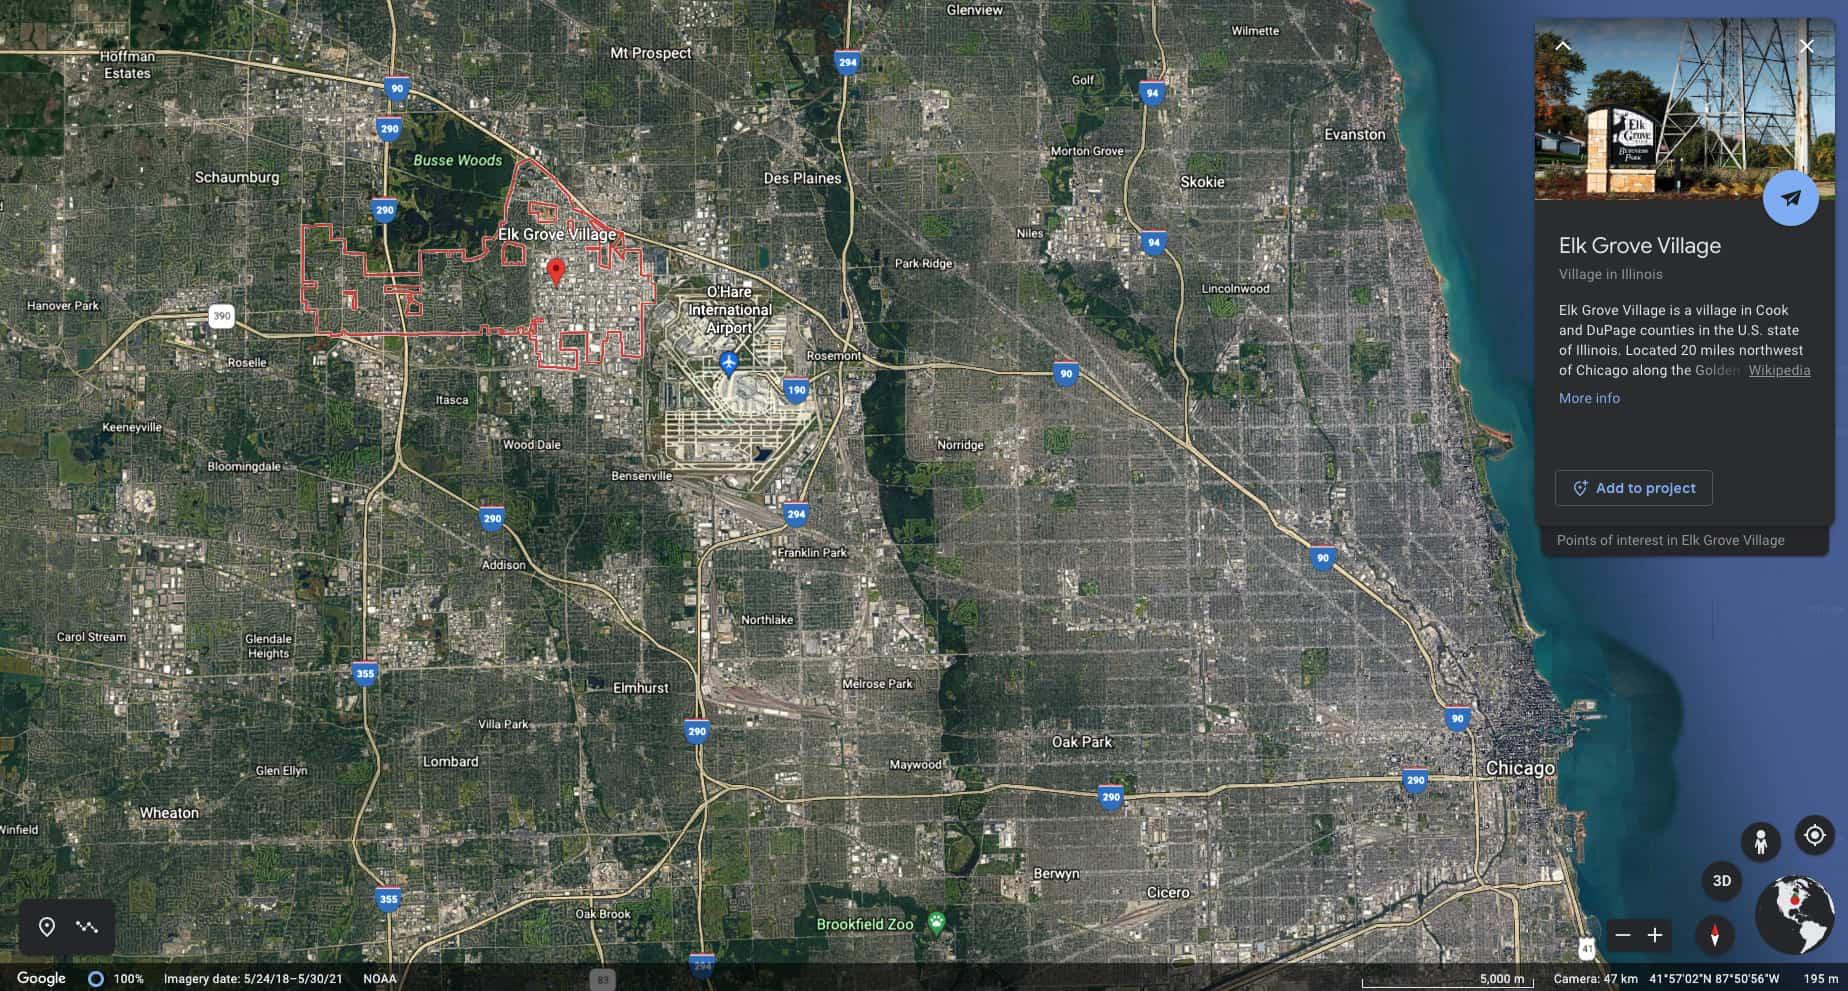 Google Earth image of Elk Grove Village, IL